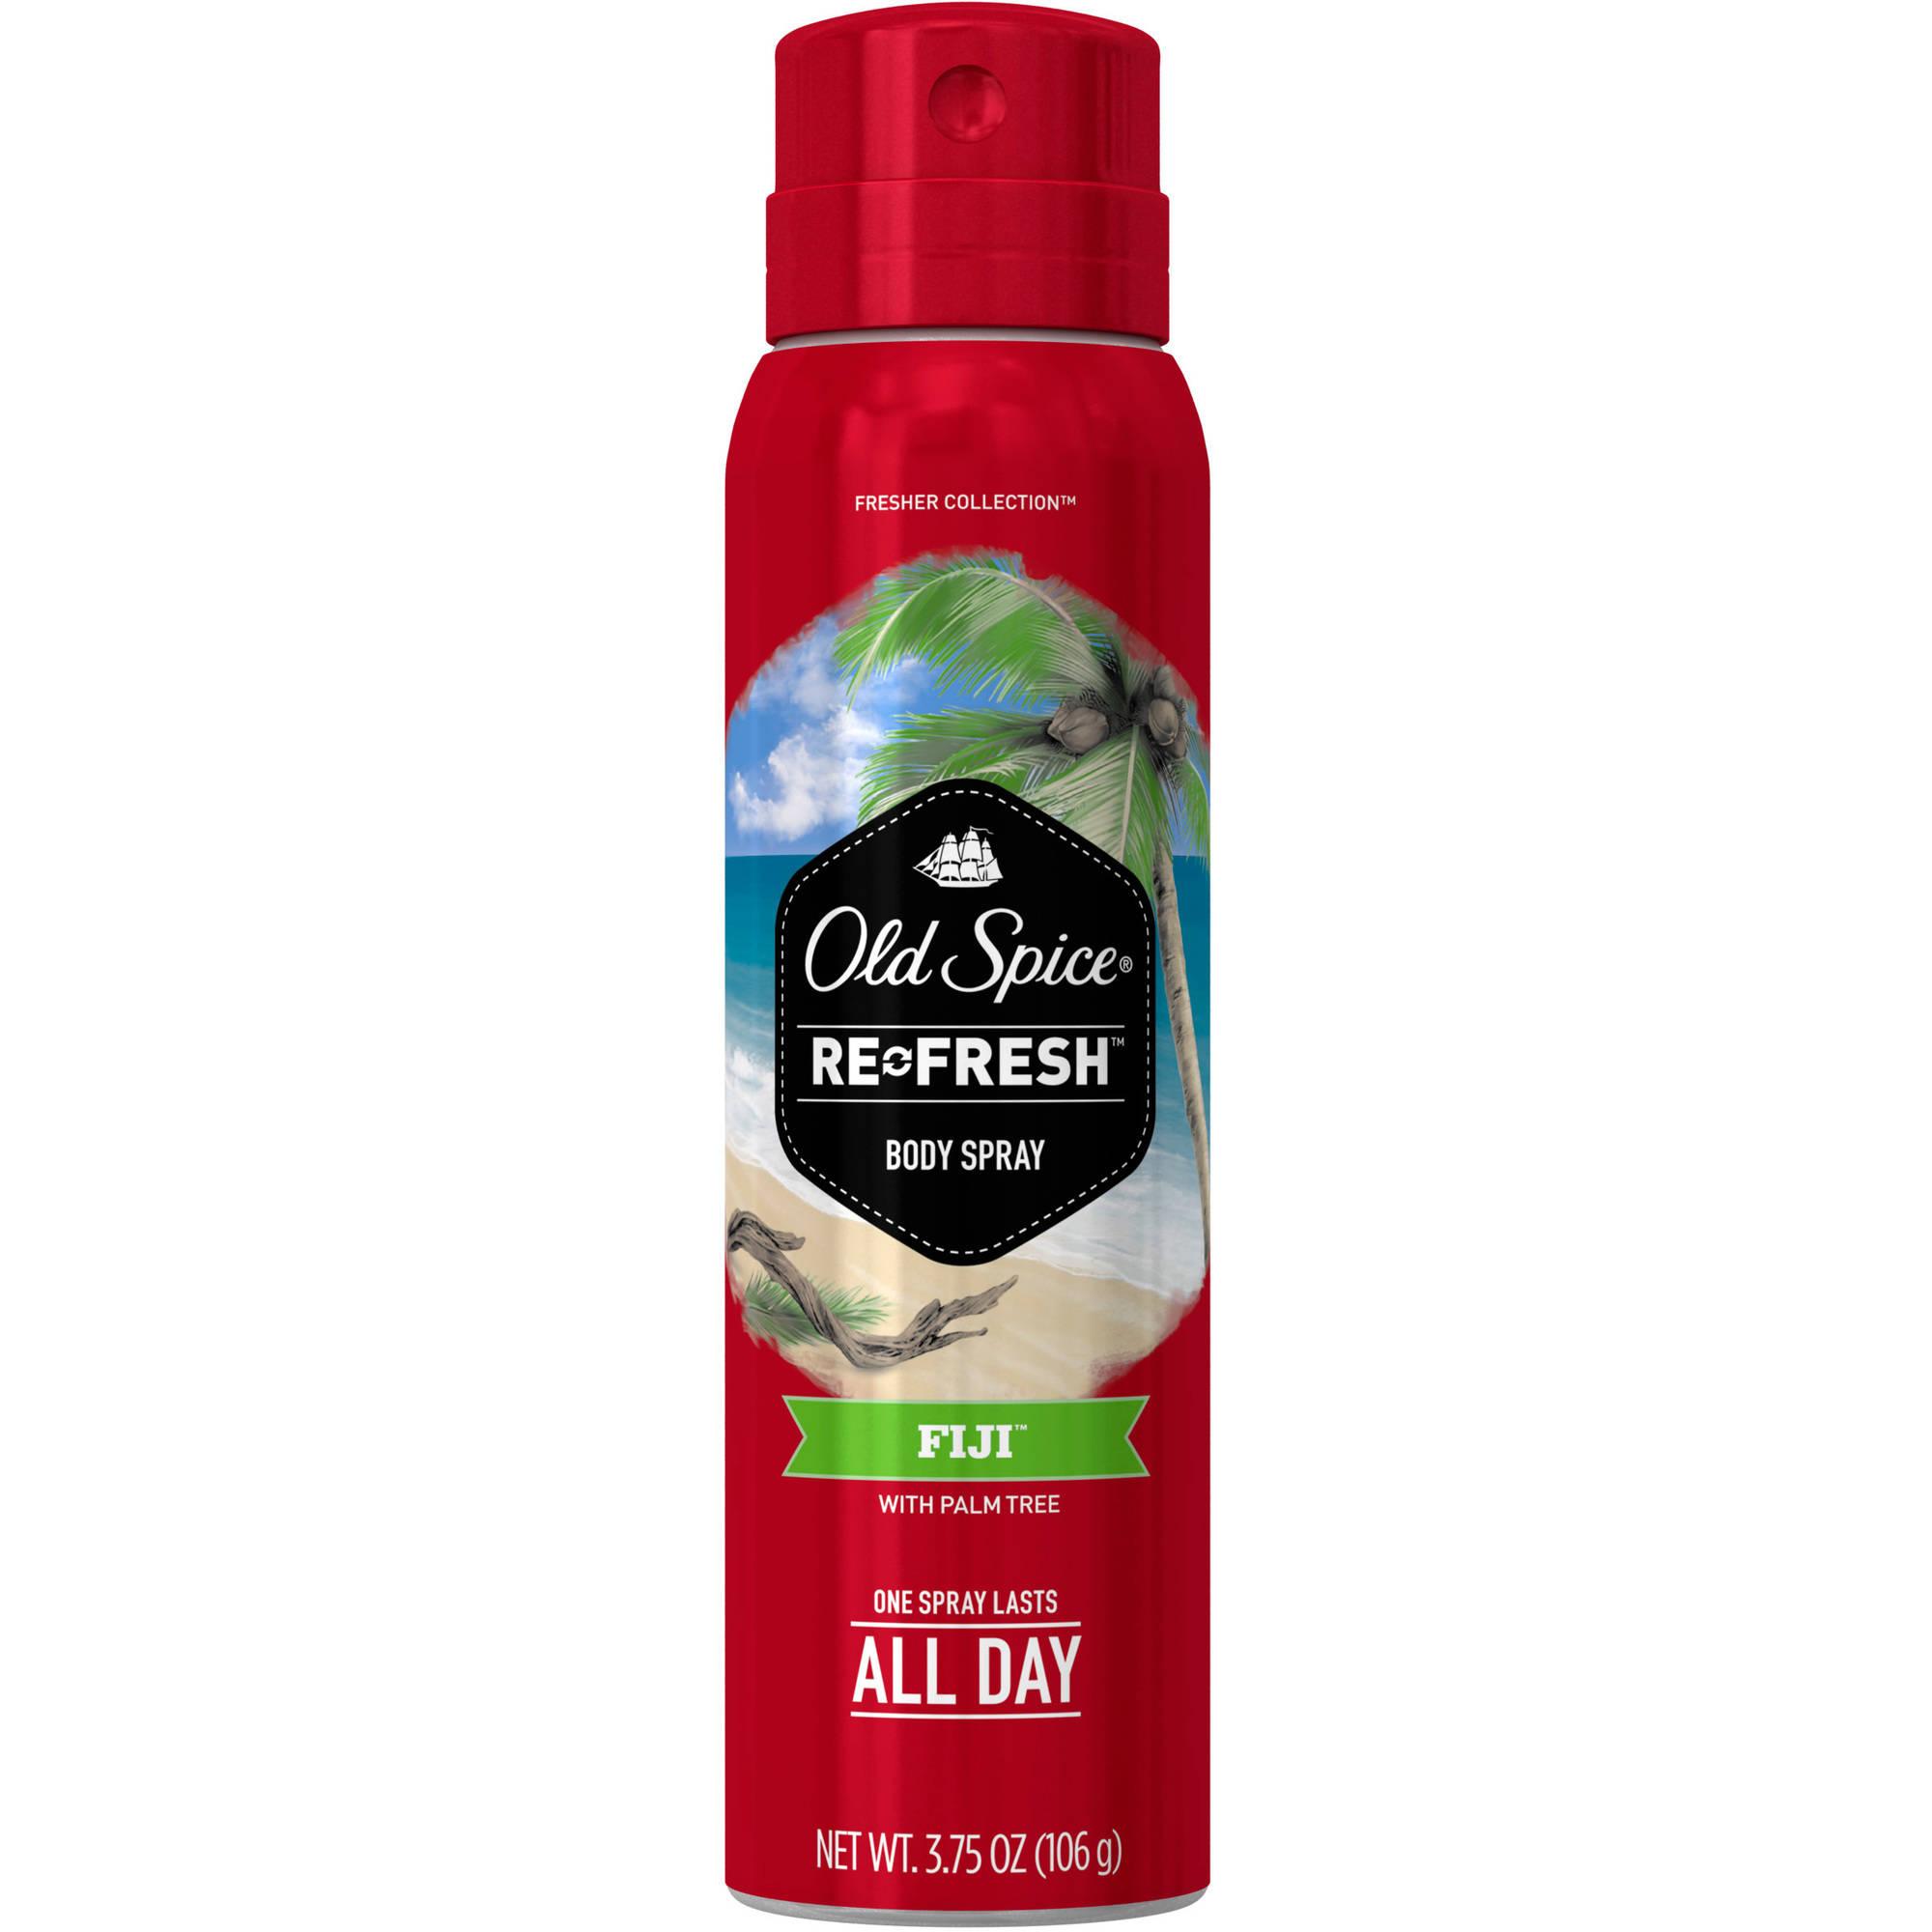 Old Spice Fresh Collection Refresh Fiji Body Spray, 3.75 fl oz